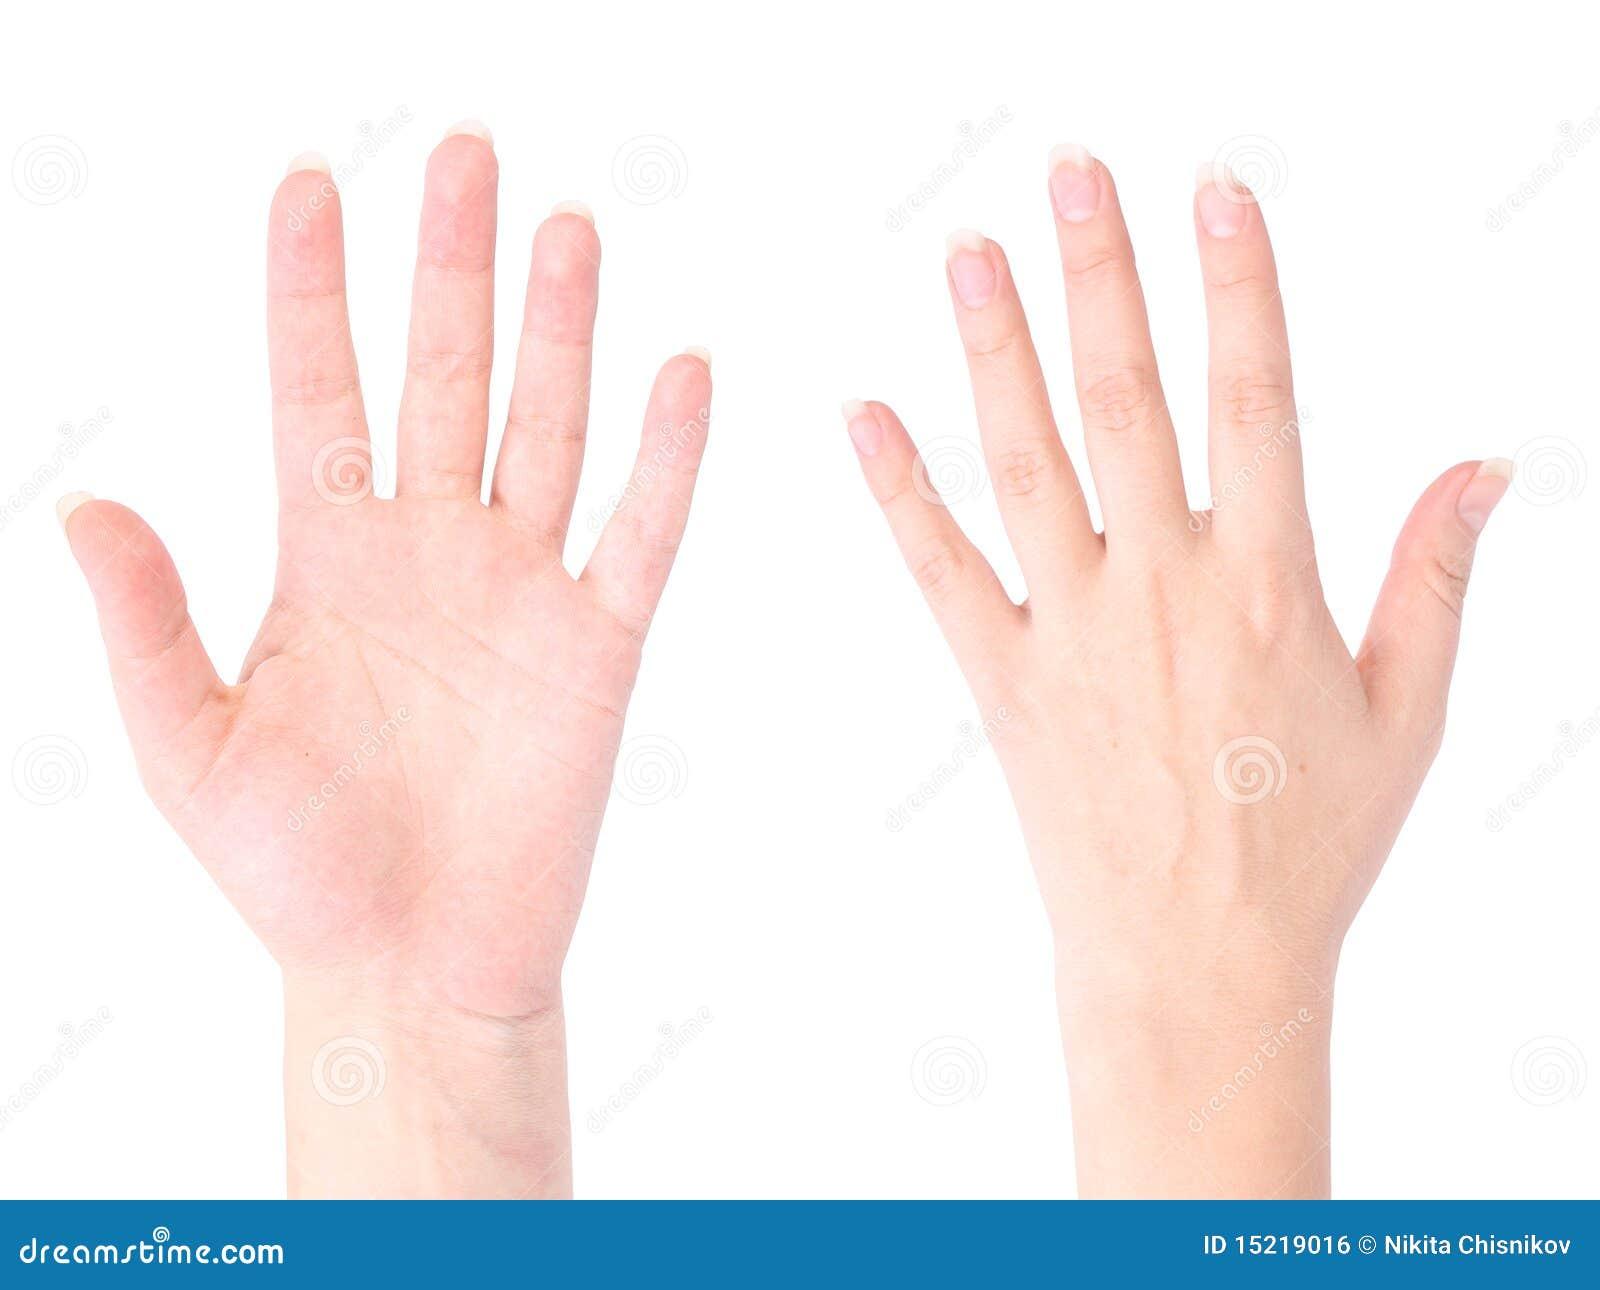 La main dans sa chatte PHOTO - sexehormonemalecom